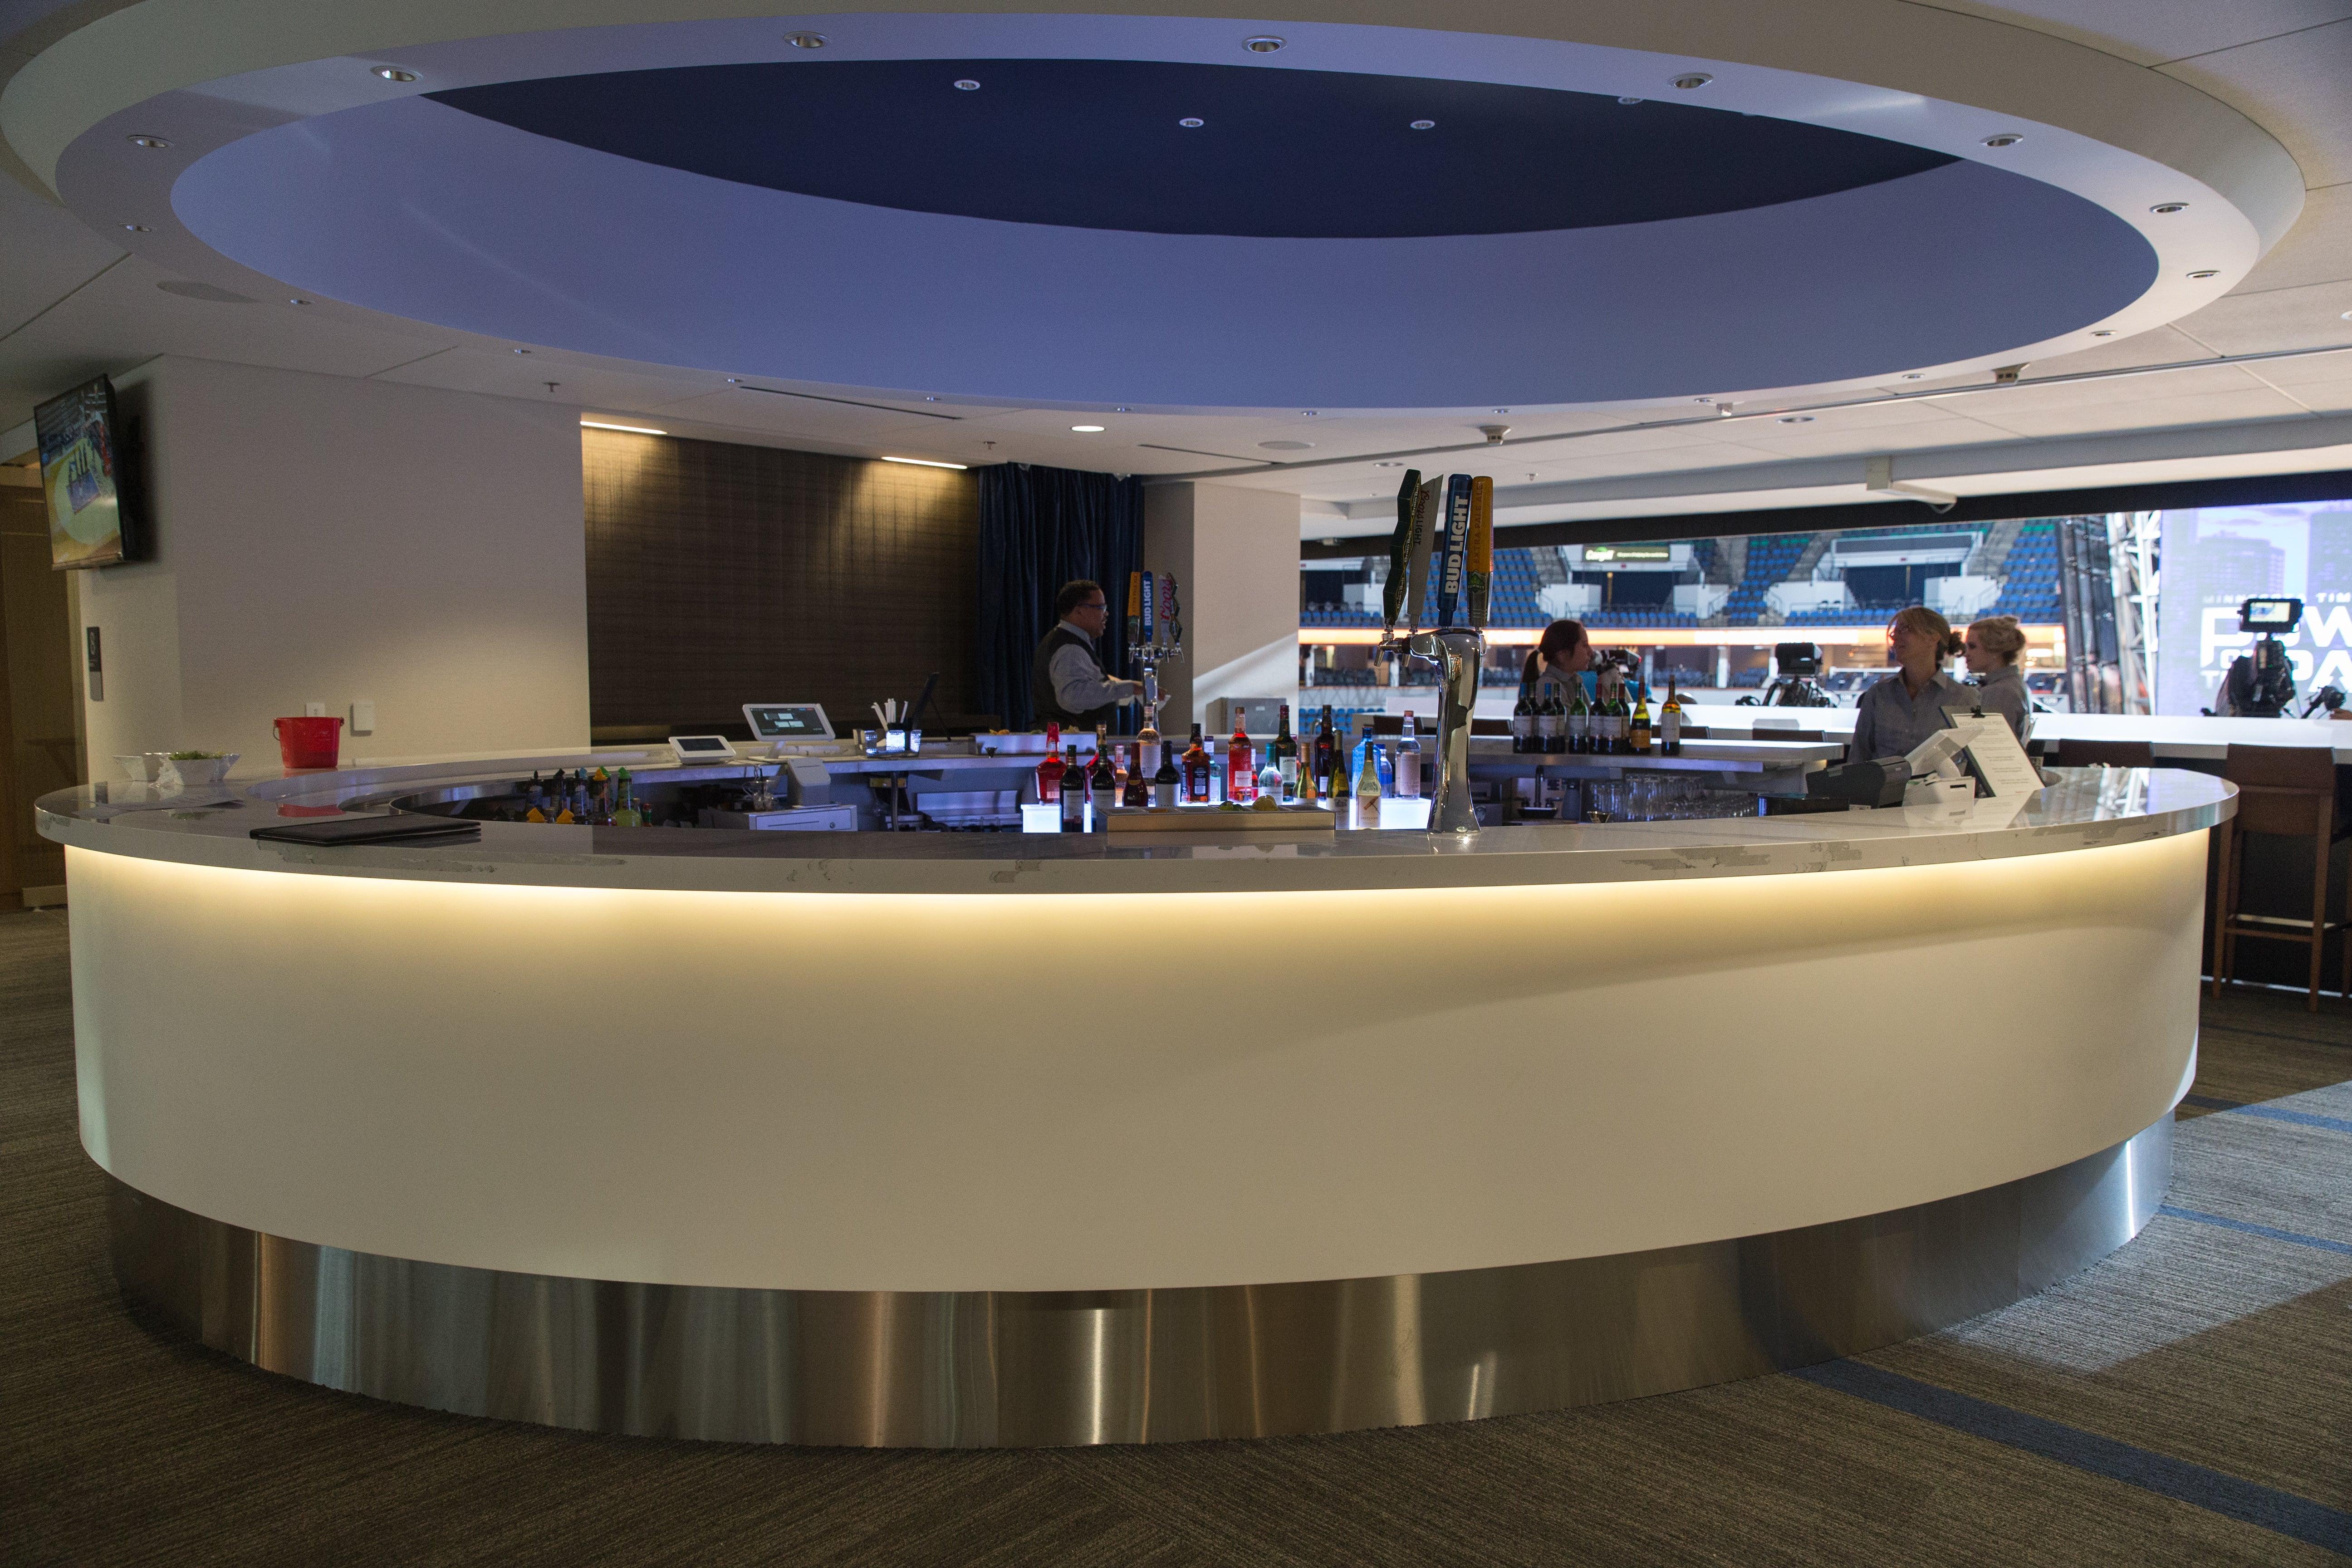 target-center-ti-resort-casino-premium-high-res-161024-chairmans-club.jpg